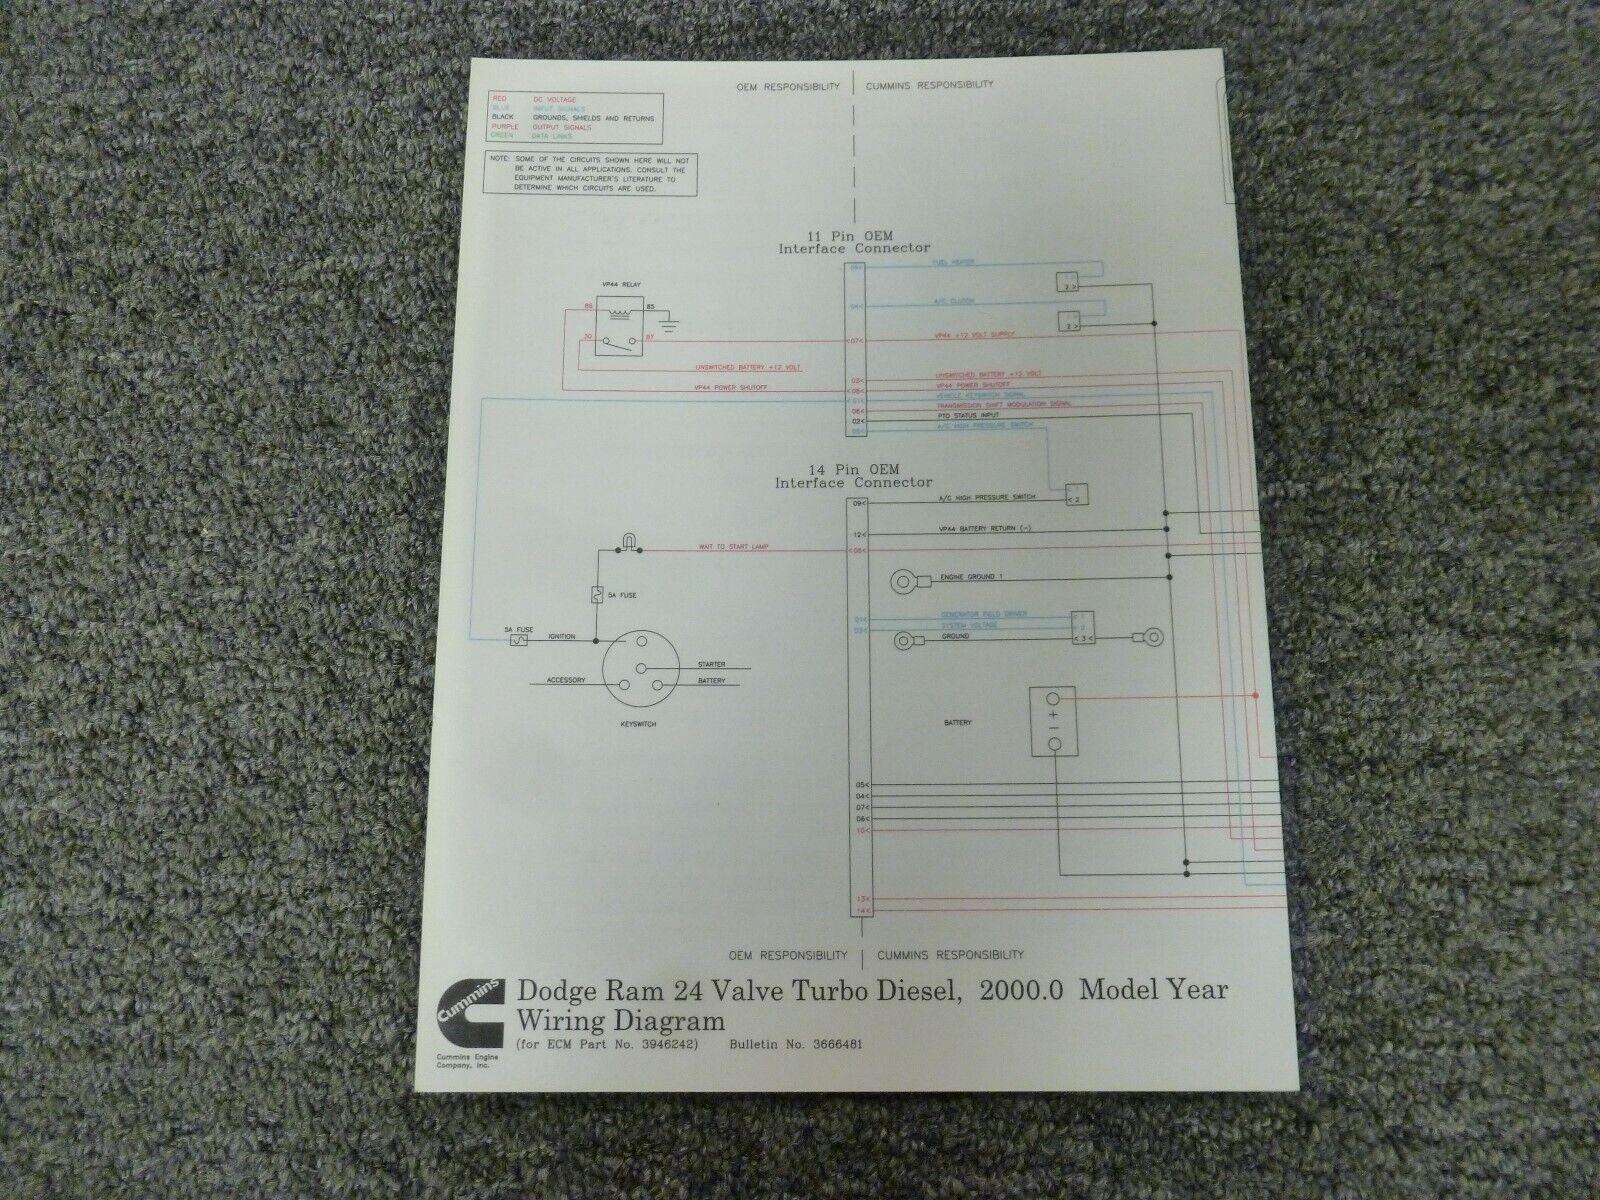 2000 Dodge Ram 2500 5.9L Cummins Turbo Diesel Electrical Wiring Diagram  Manual | eBayeBay